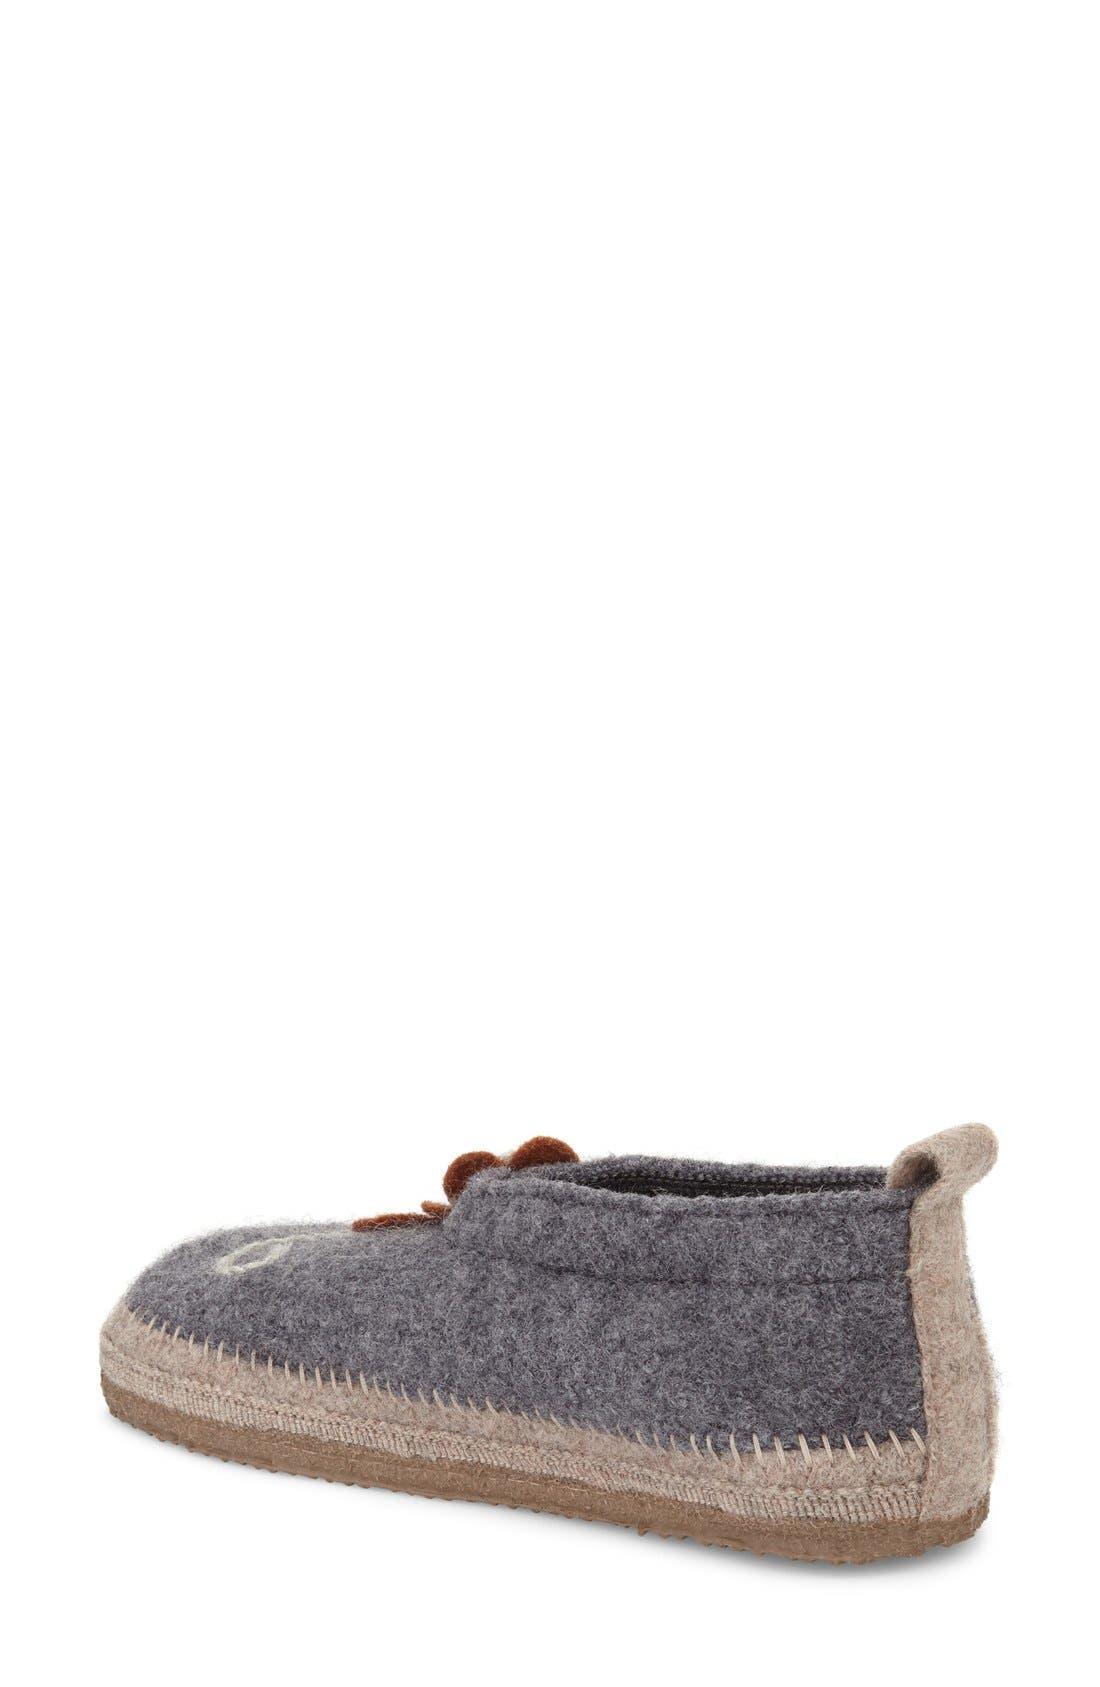 'Lunz' Slipper,                             Alternate thumbnail 2, color,                             Stone Wool